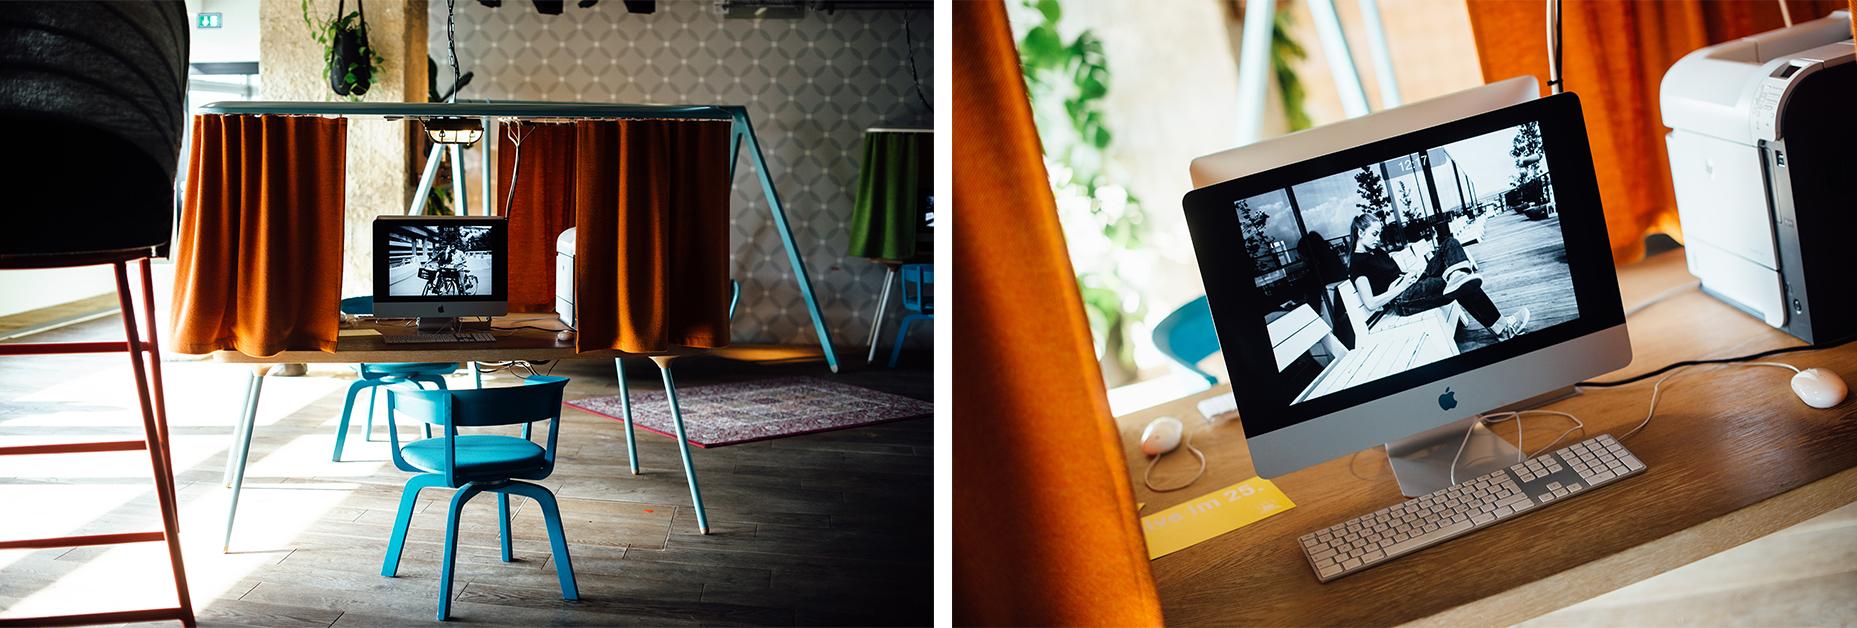 25hours-hotel-bikini-berlin_jungle-sauna_berlin-tiergarten_review_erfahrungsbericht_modeblog_reiseblog_kiamisu-50